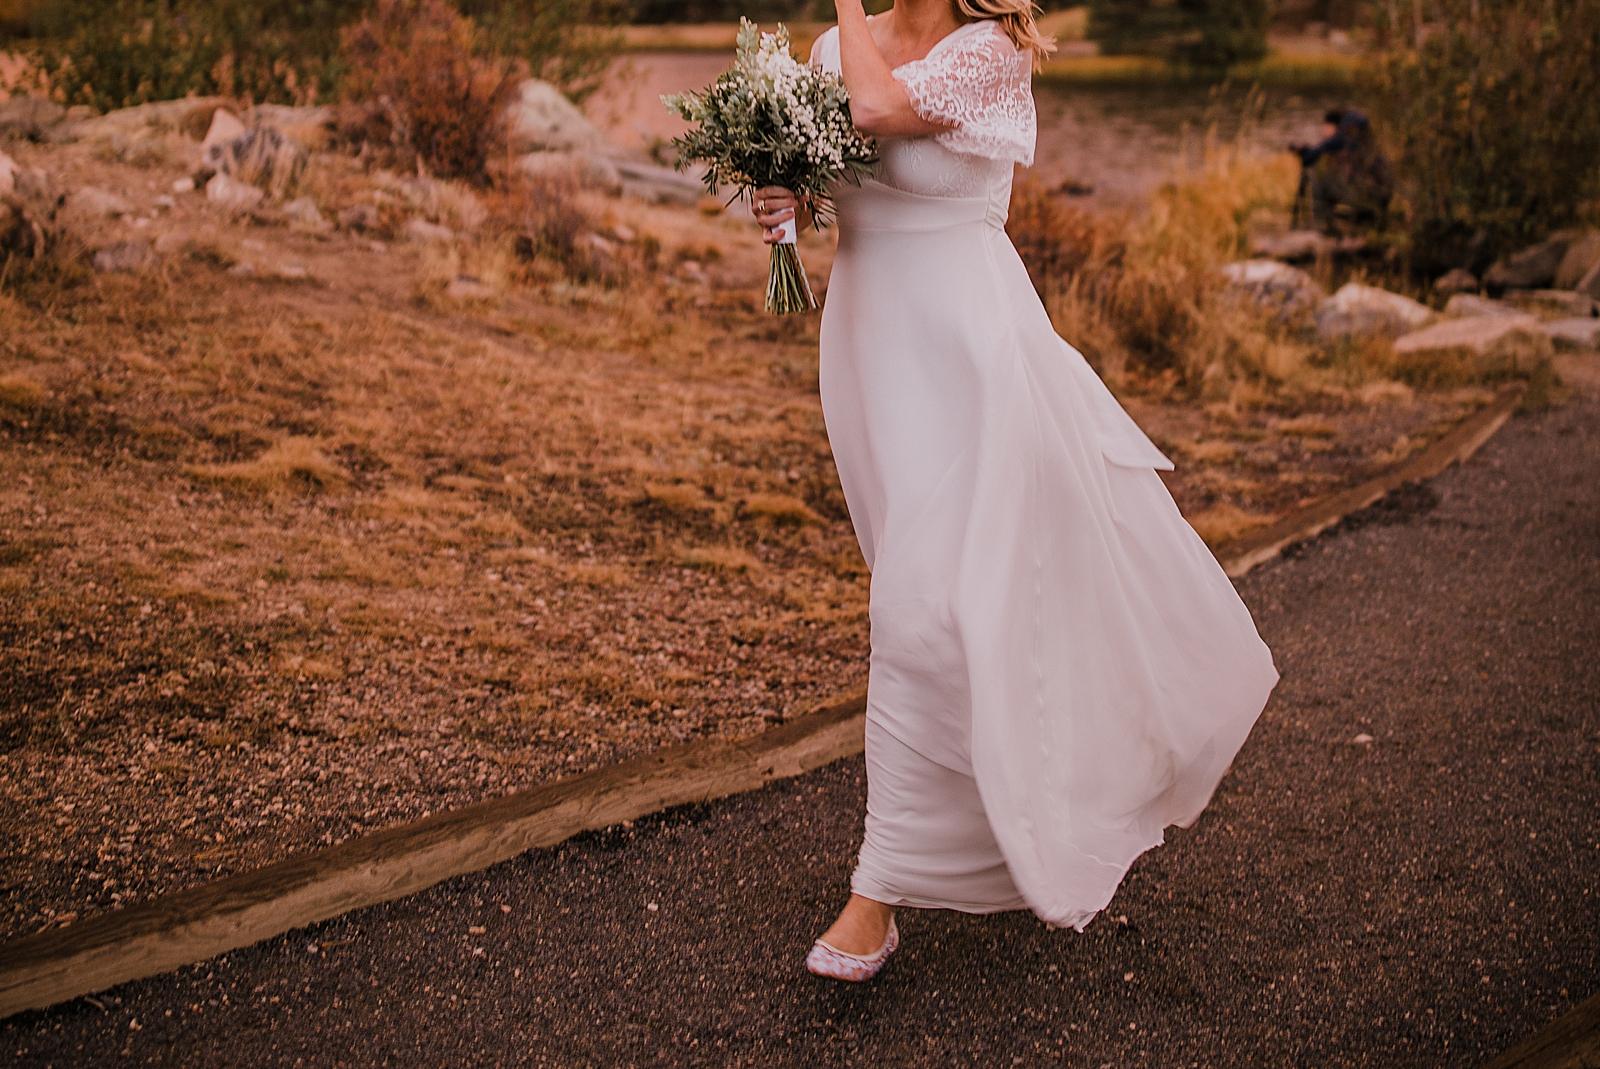 lulus wedding dress, sunrise elopement, colorado elopement, sprague lake elopement, sprague lake wedding, rocky mountain national park elopement, adventurous colorado hiking elopement